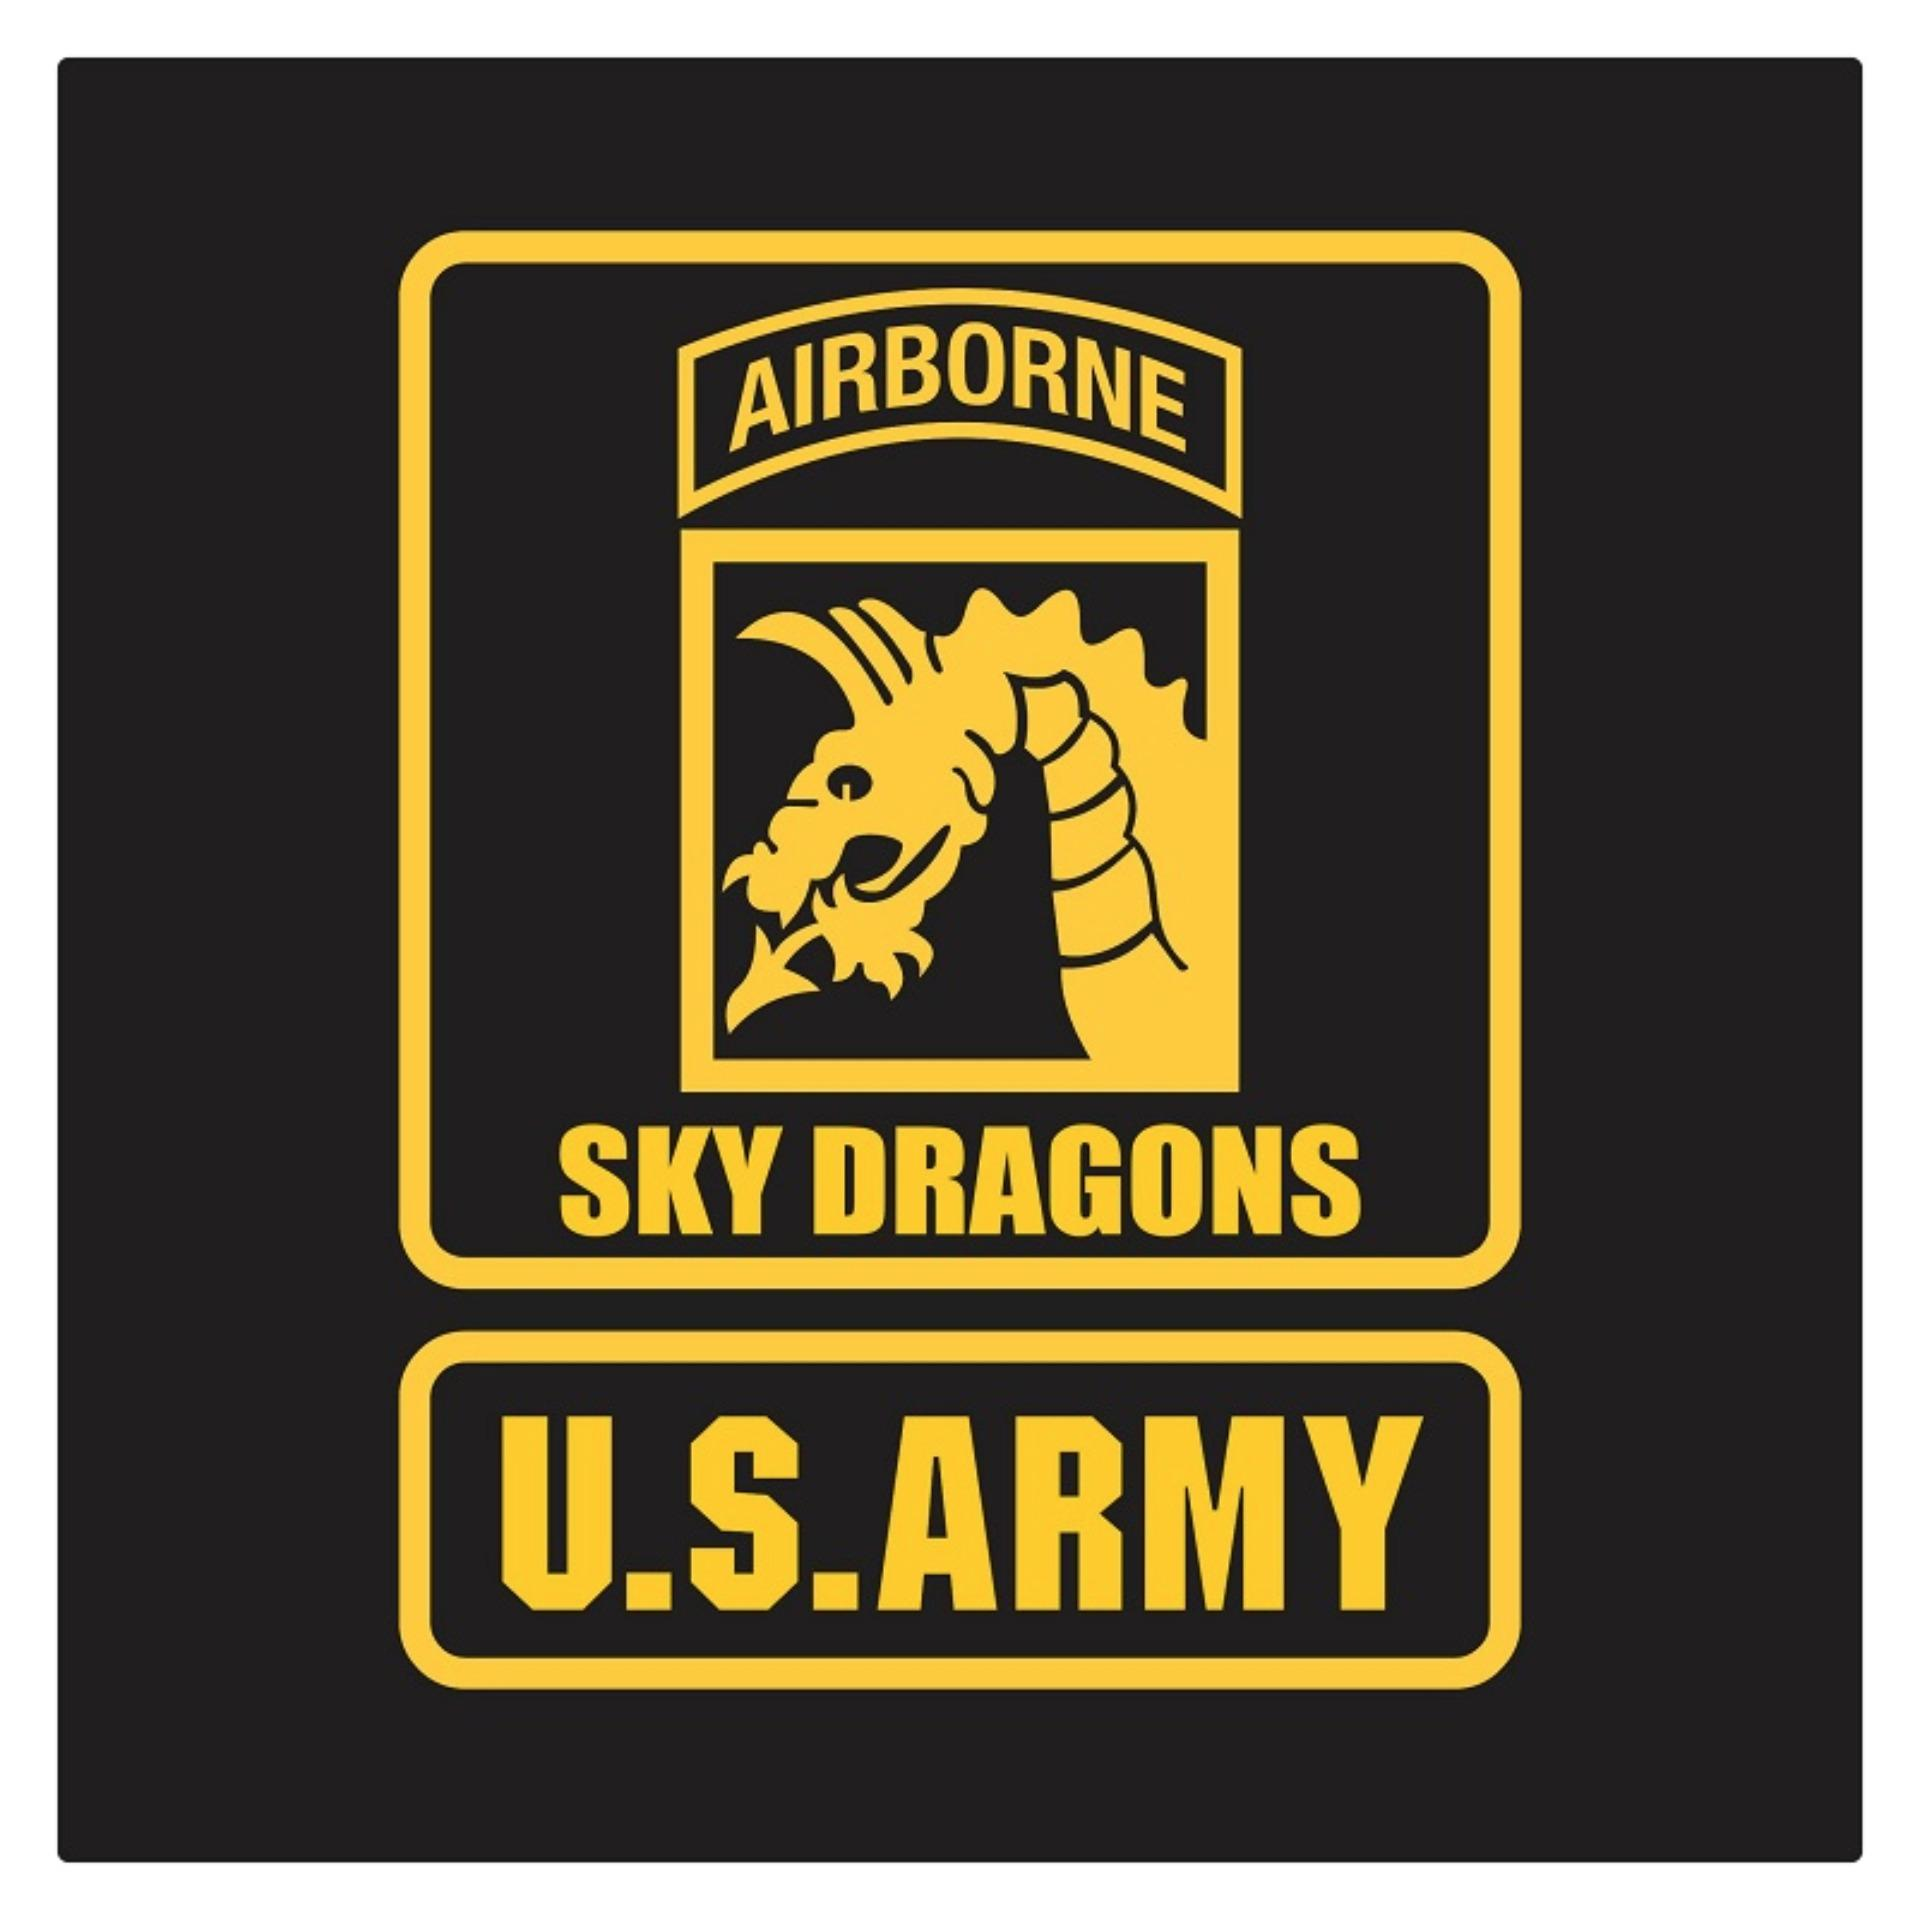 Fighterstown US Army Airborne XVIII Sky Dragons Badge Cutting Sticker